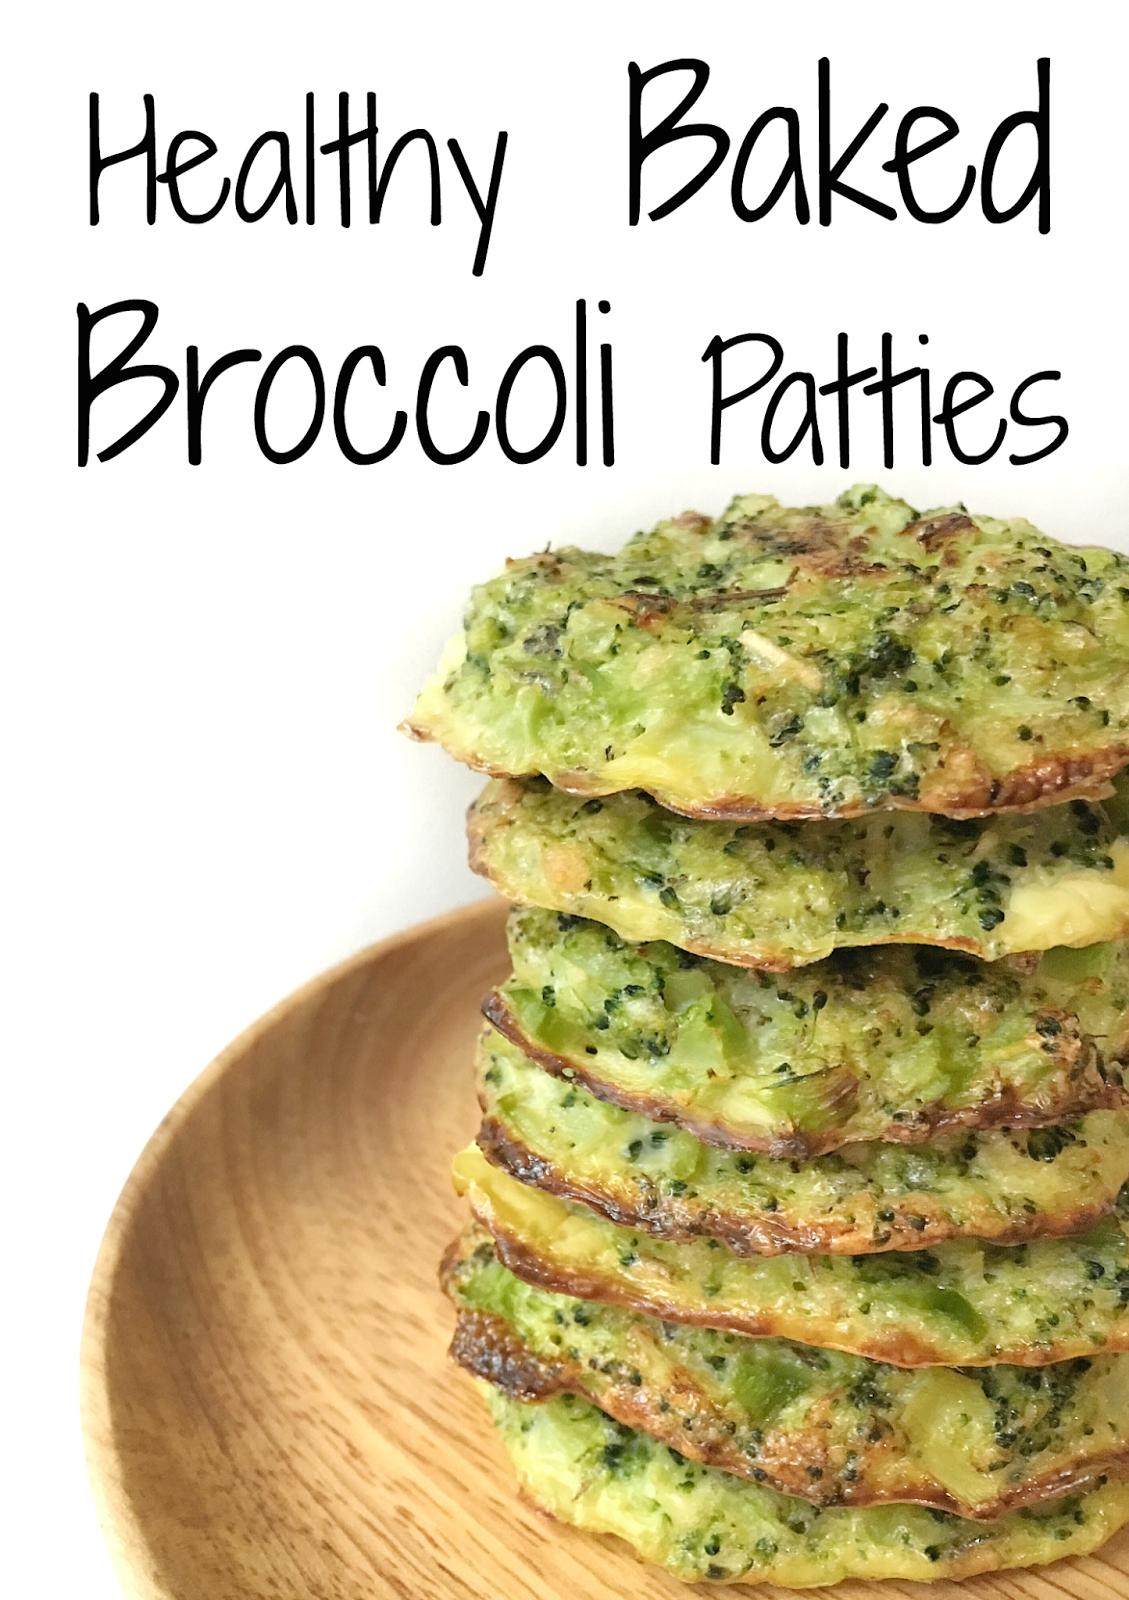 Healthy Baked Broccoli Patties